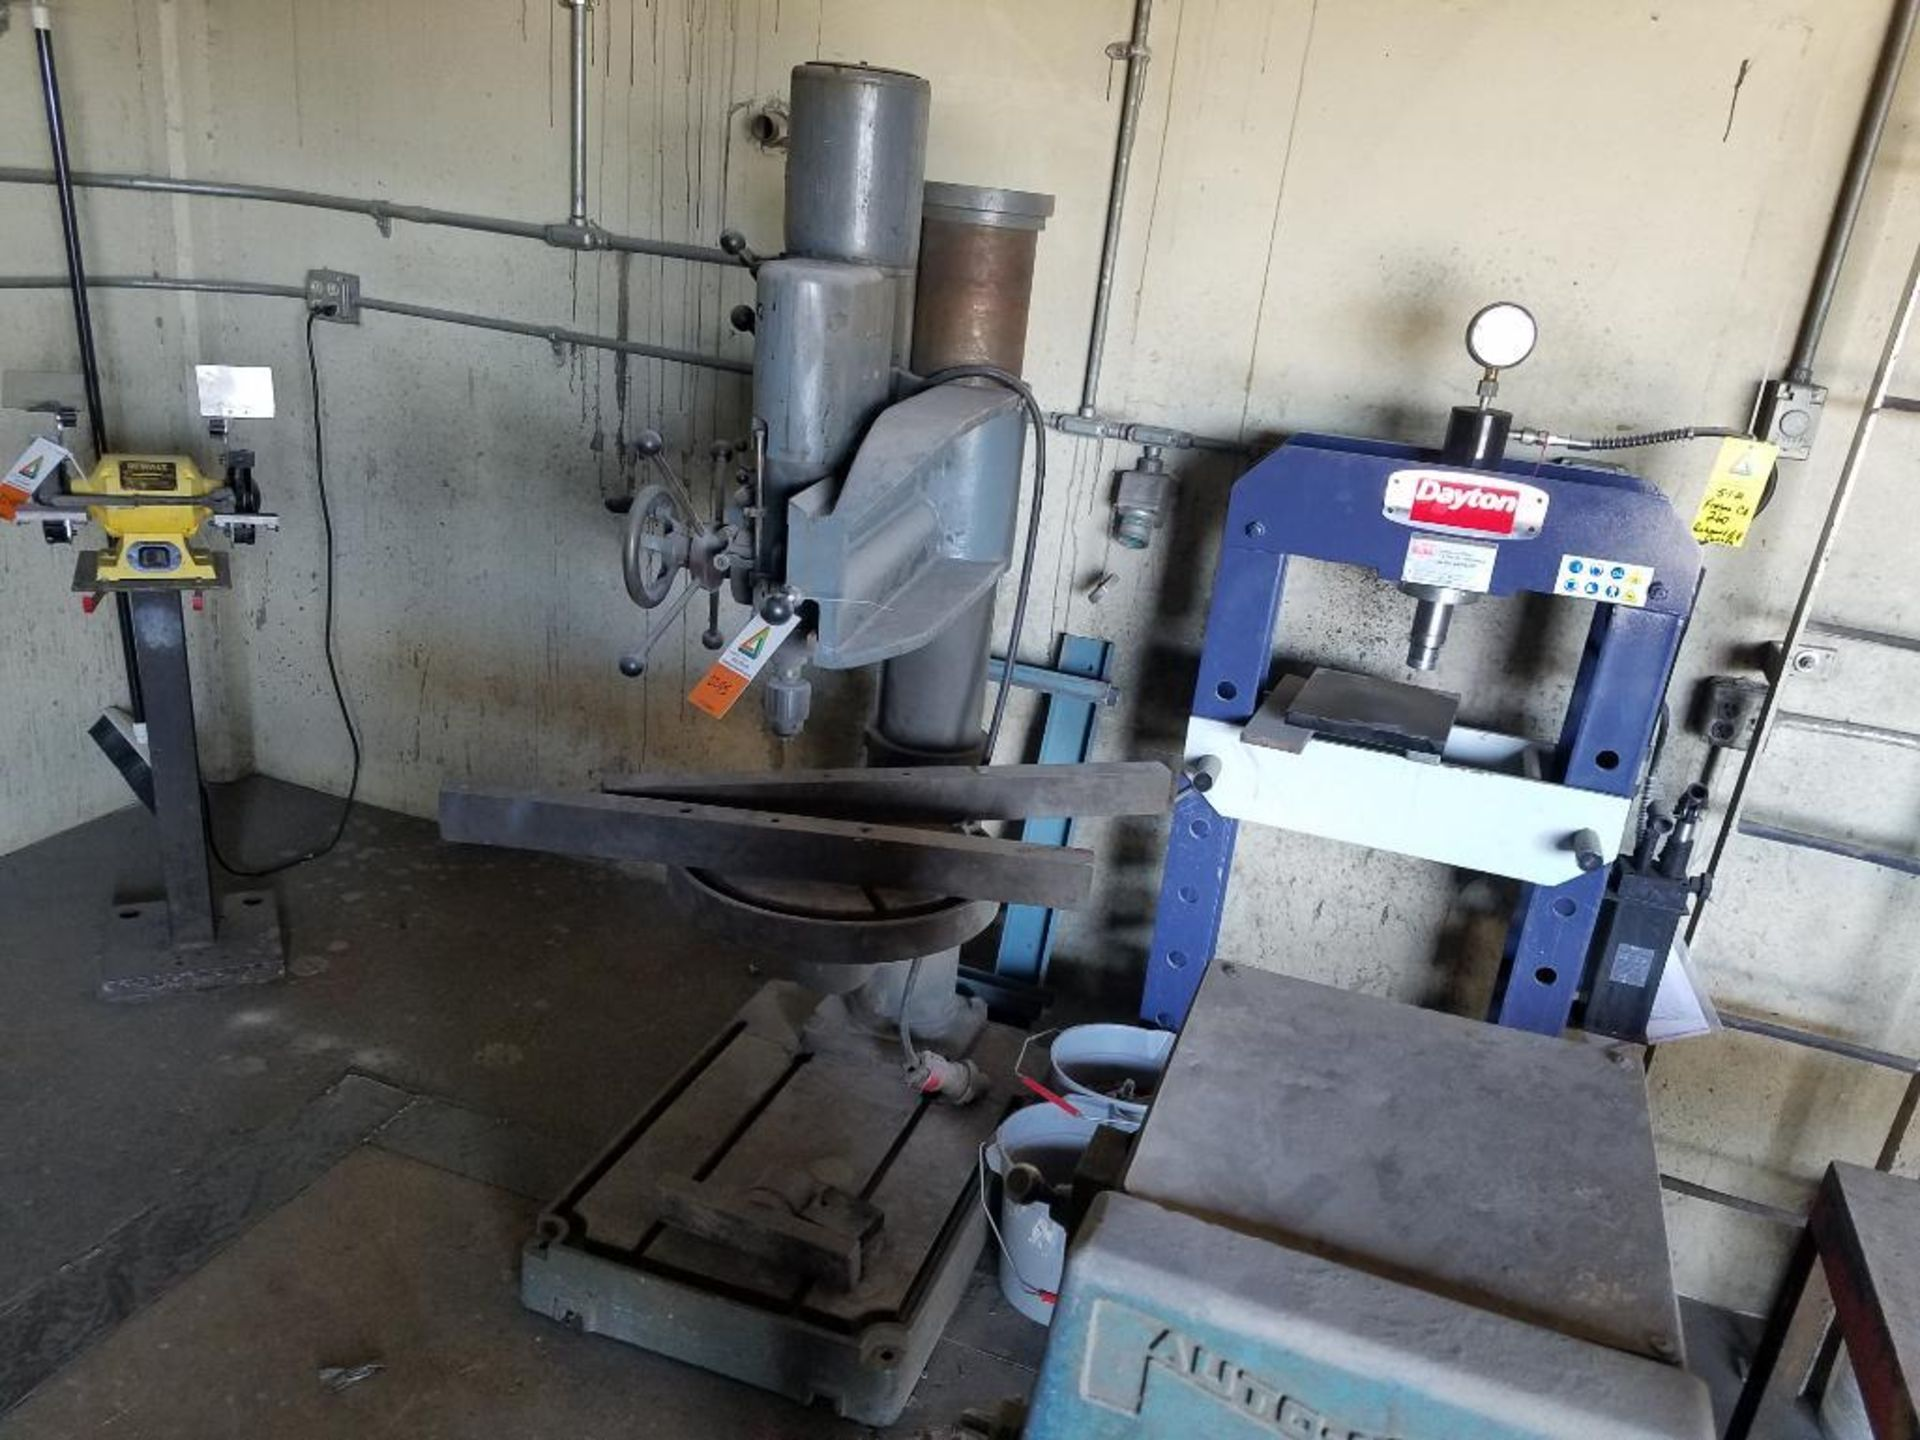 Abarboga Maskiner radial arm drill - Image 5 of 5